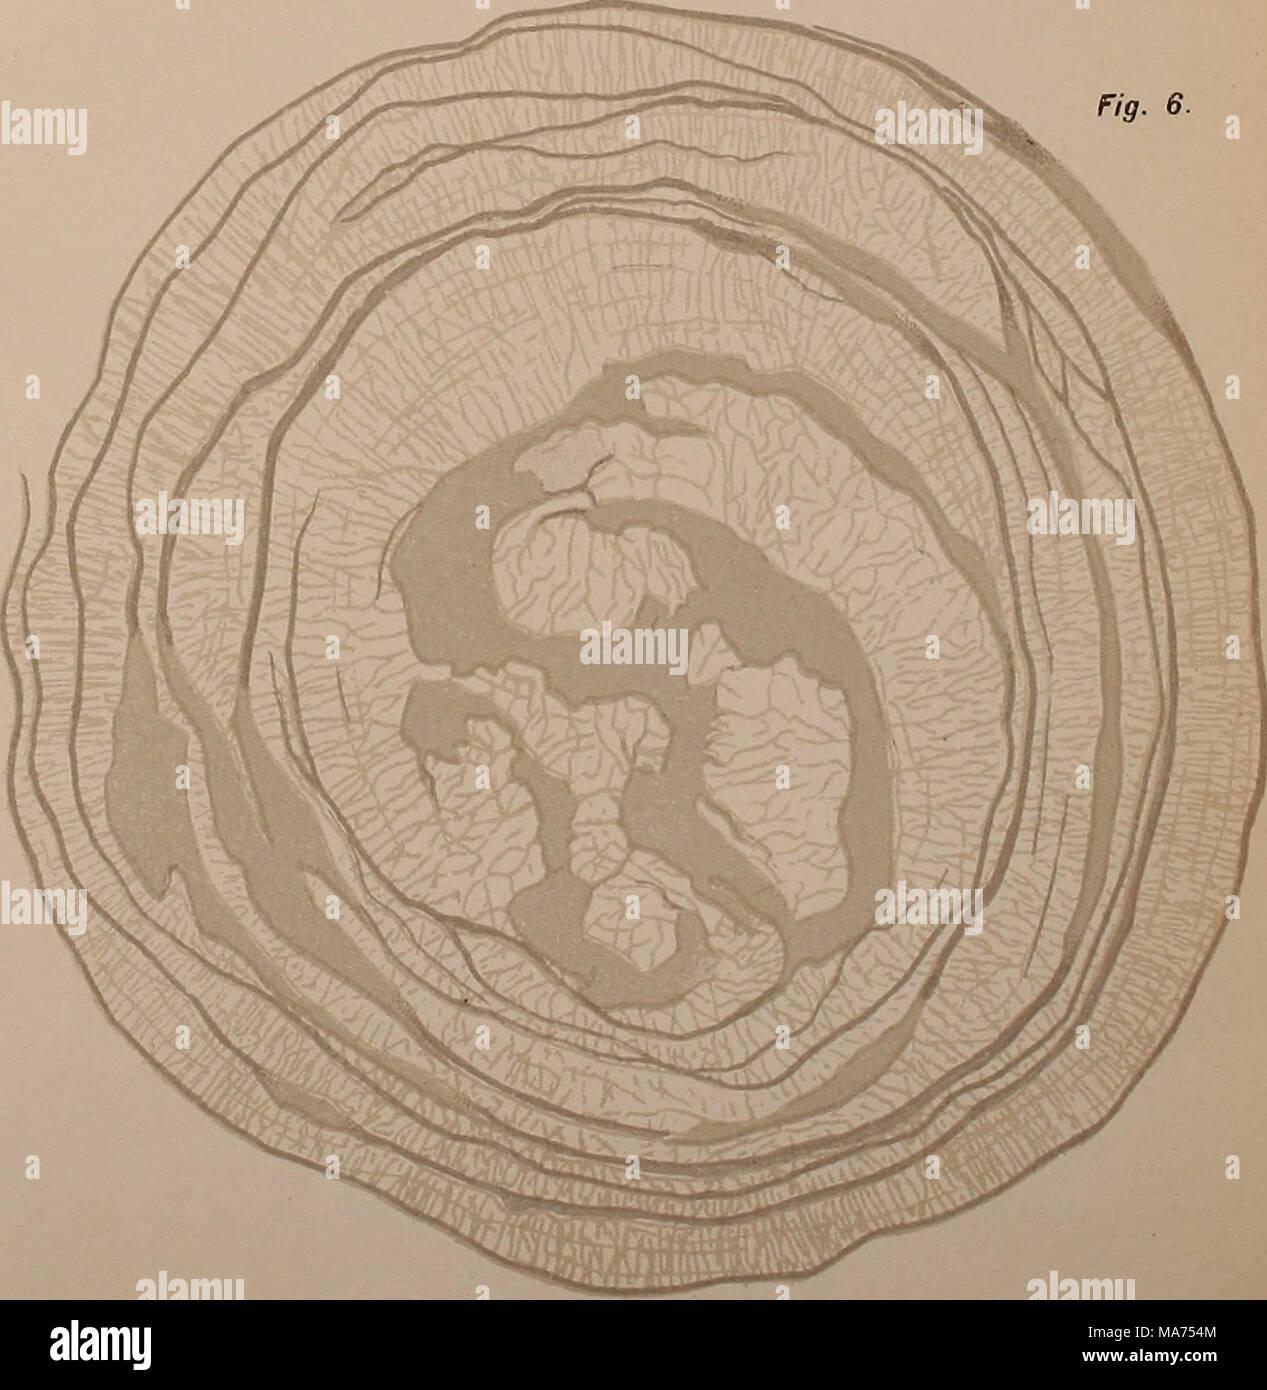 ". Eerste ontwikkelingsstadiÃ"" n van Megalobatrachus maximus Schlegel. fi^-I, III, V, VI Mej. J. Mételeekamp, Del., Abb. - II DE IV L. ¥ â de Bus 3 à ¯. del LHh. 1. H.1 Â""; Br; Stockbild"